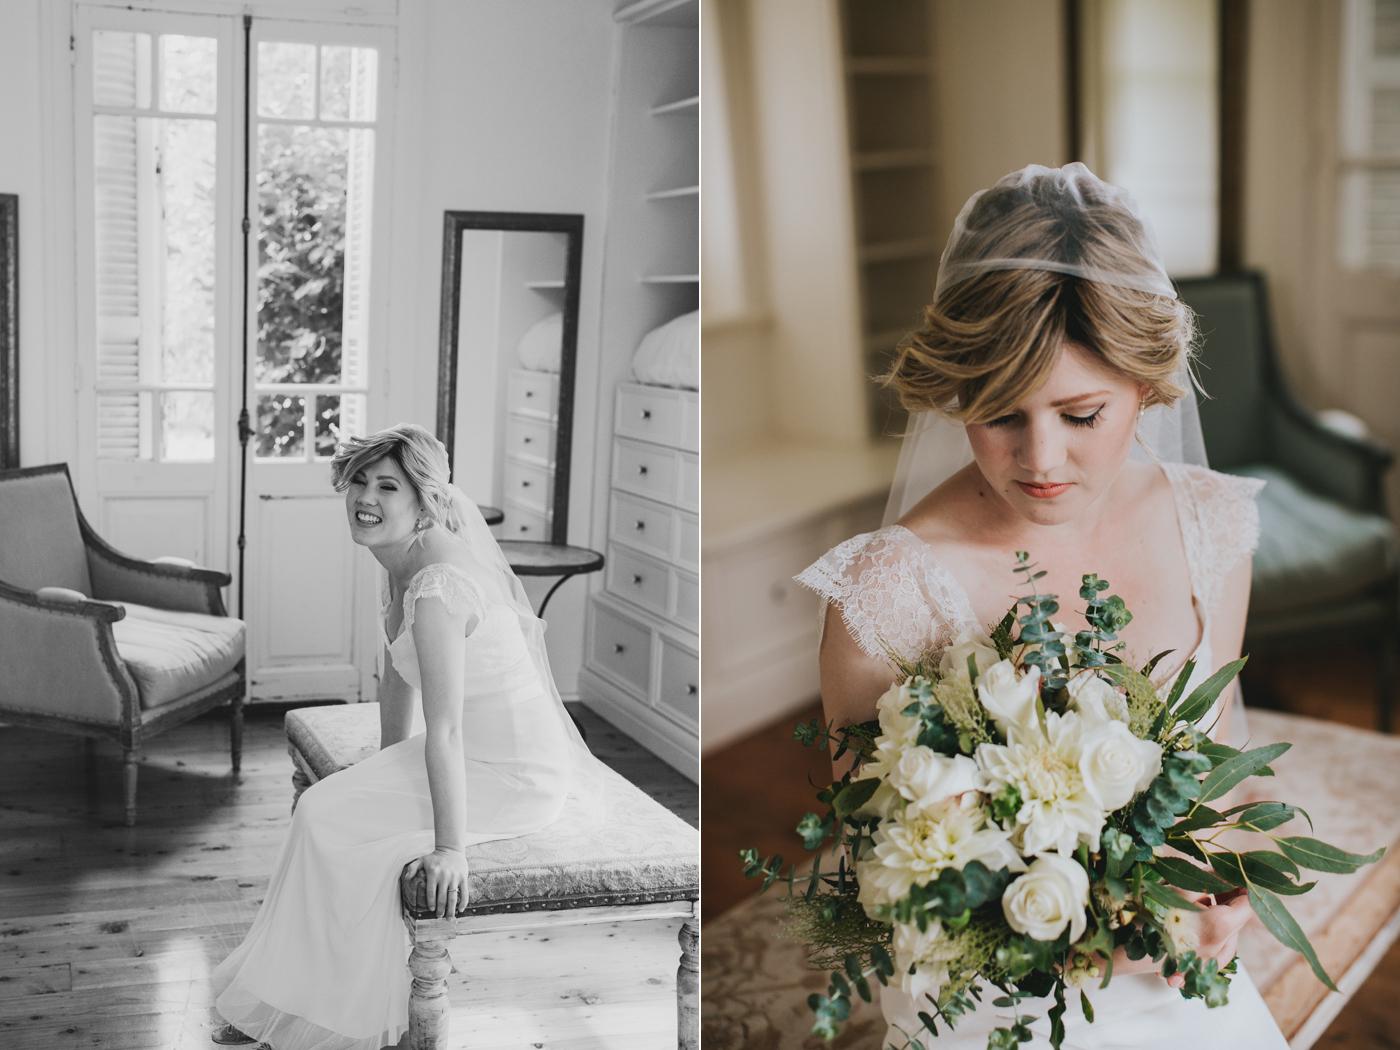 Rachel & Jacob - Willow Farm Berry - South Coast Wedding - Samantha Heather Photography-34.jpg